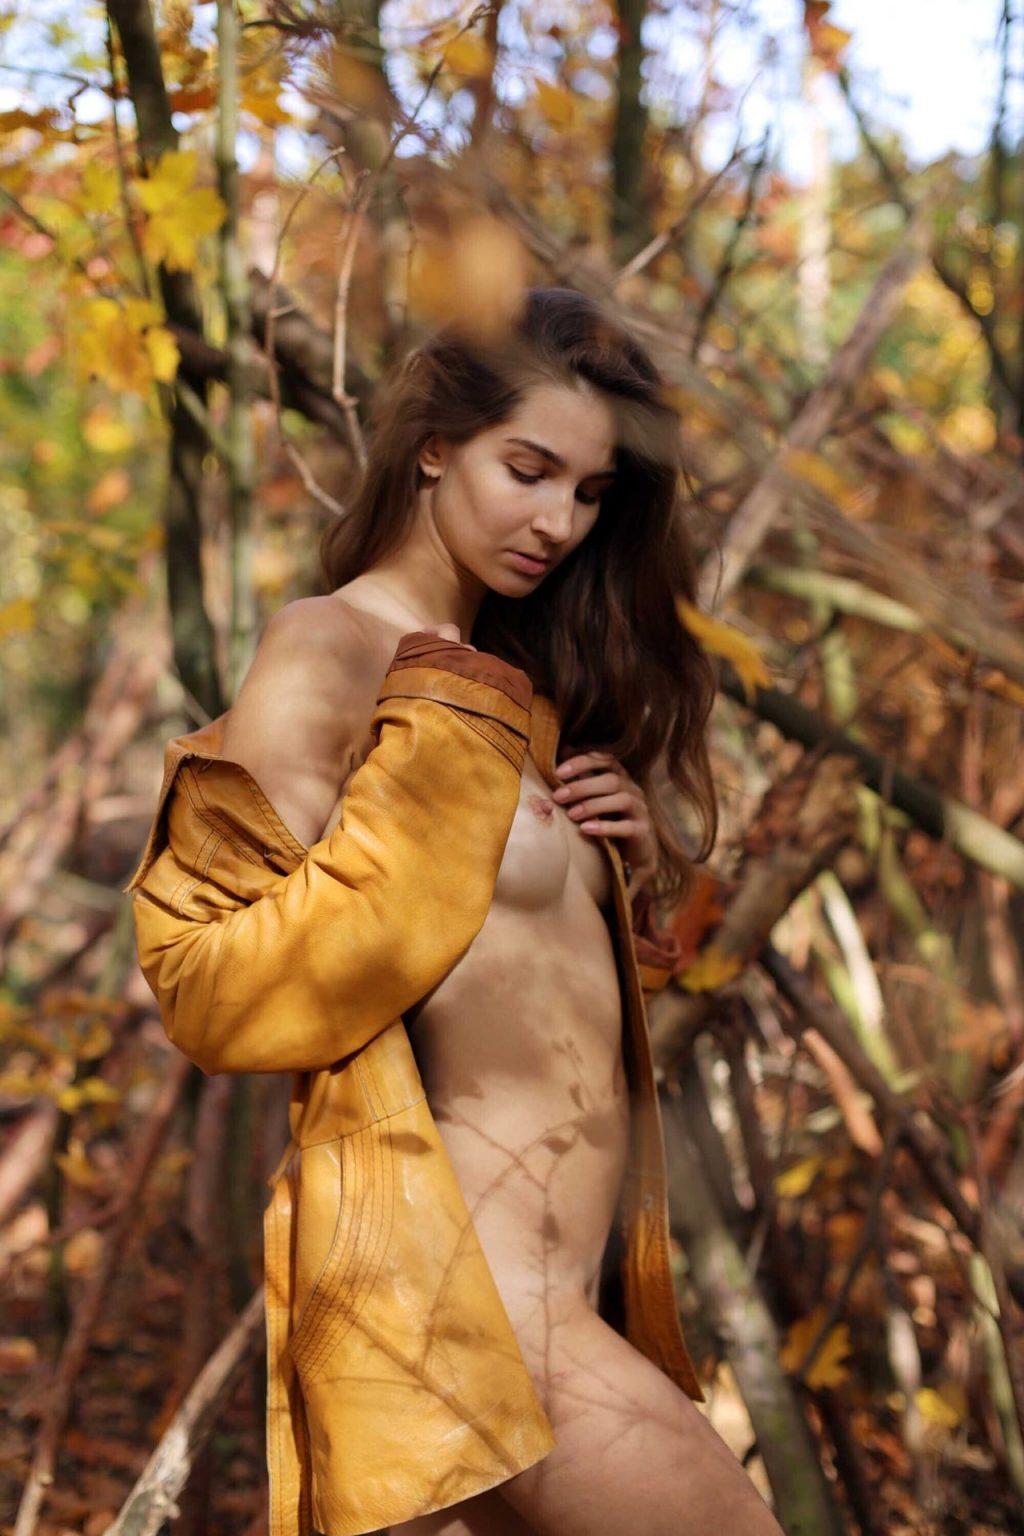 Lina-Lorenza-Nude-Sexy-The-Fappening-Blog-com-18-1024x1536